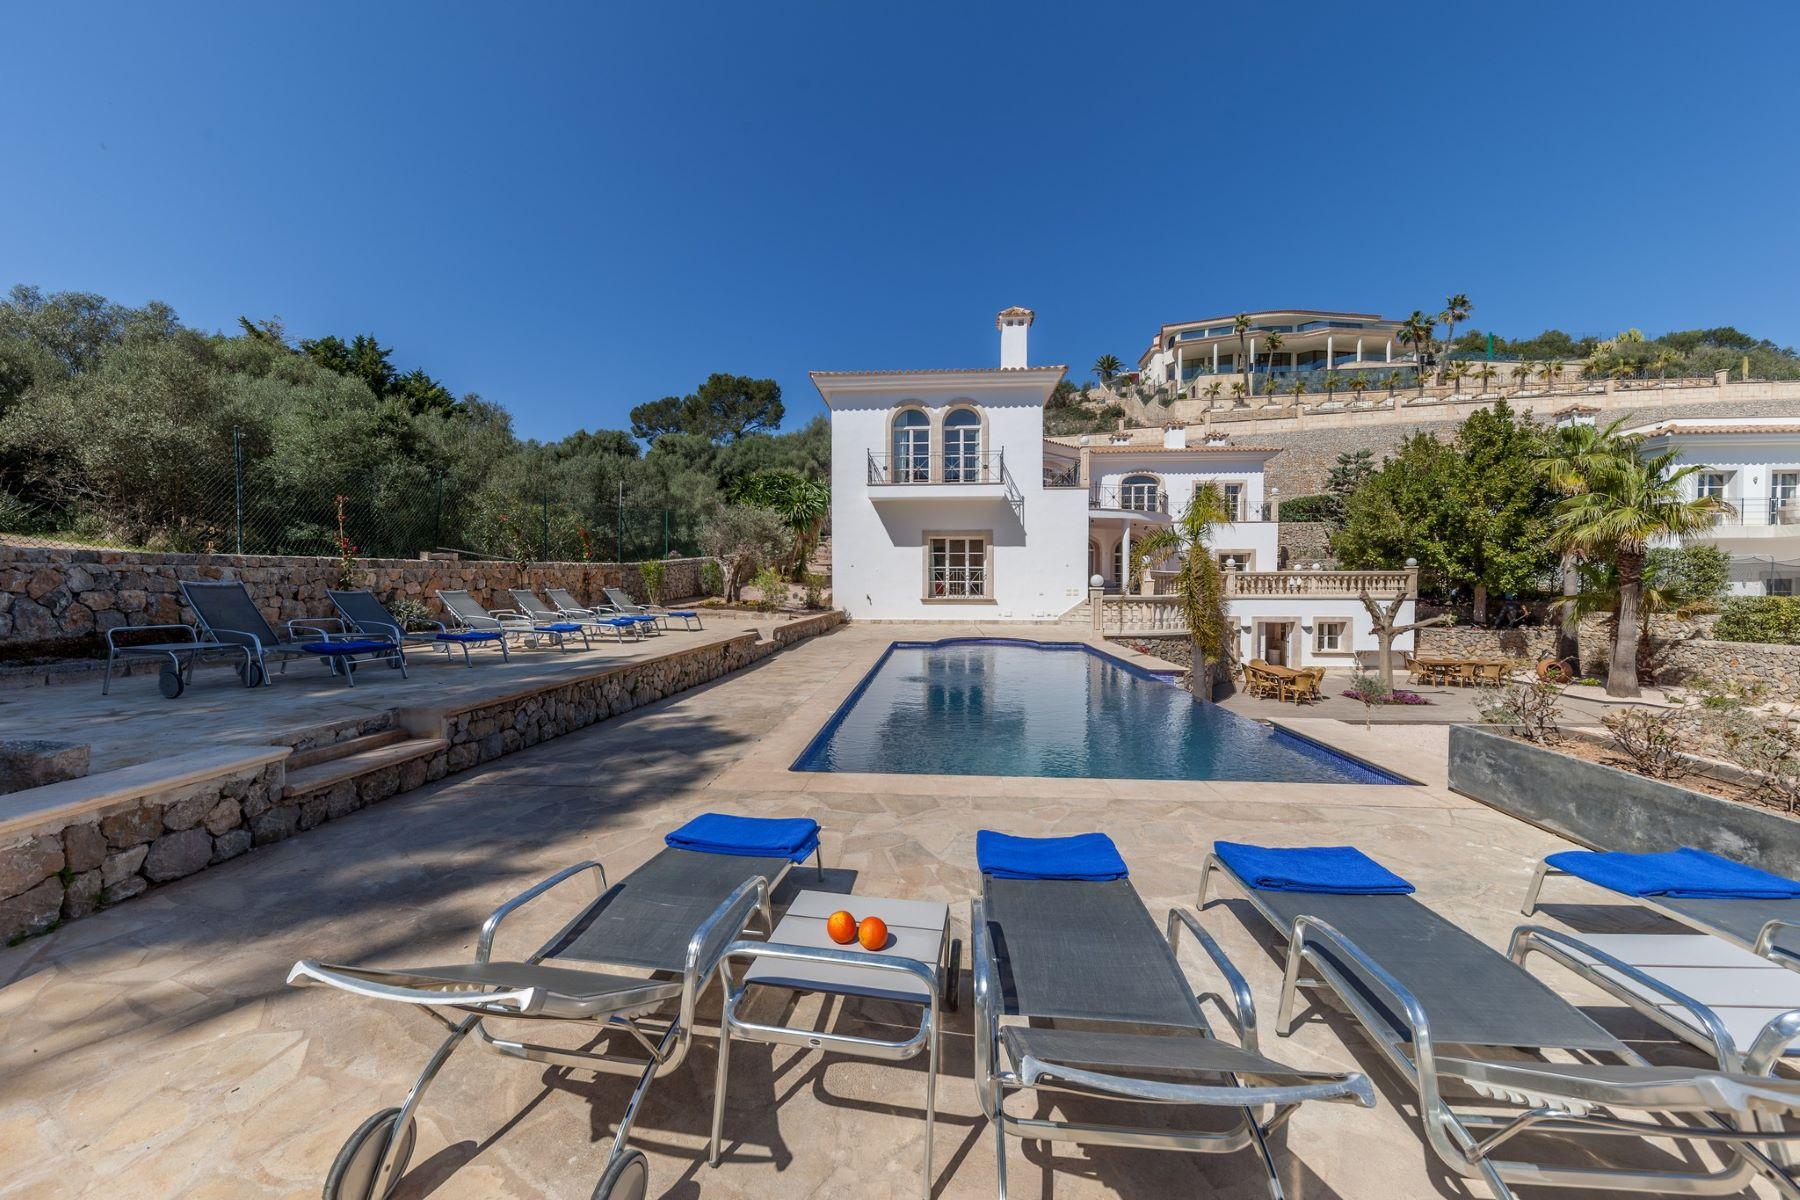 Single Family Home for Sale at Elegant villa in Son Vida Other Balearic Islands, Balearic Islands, Spain